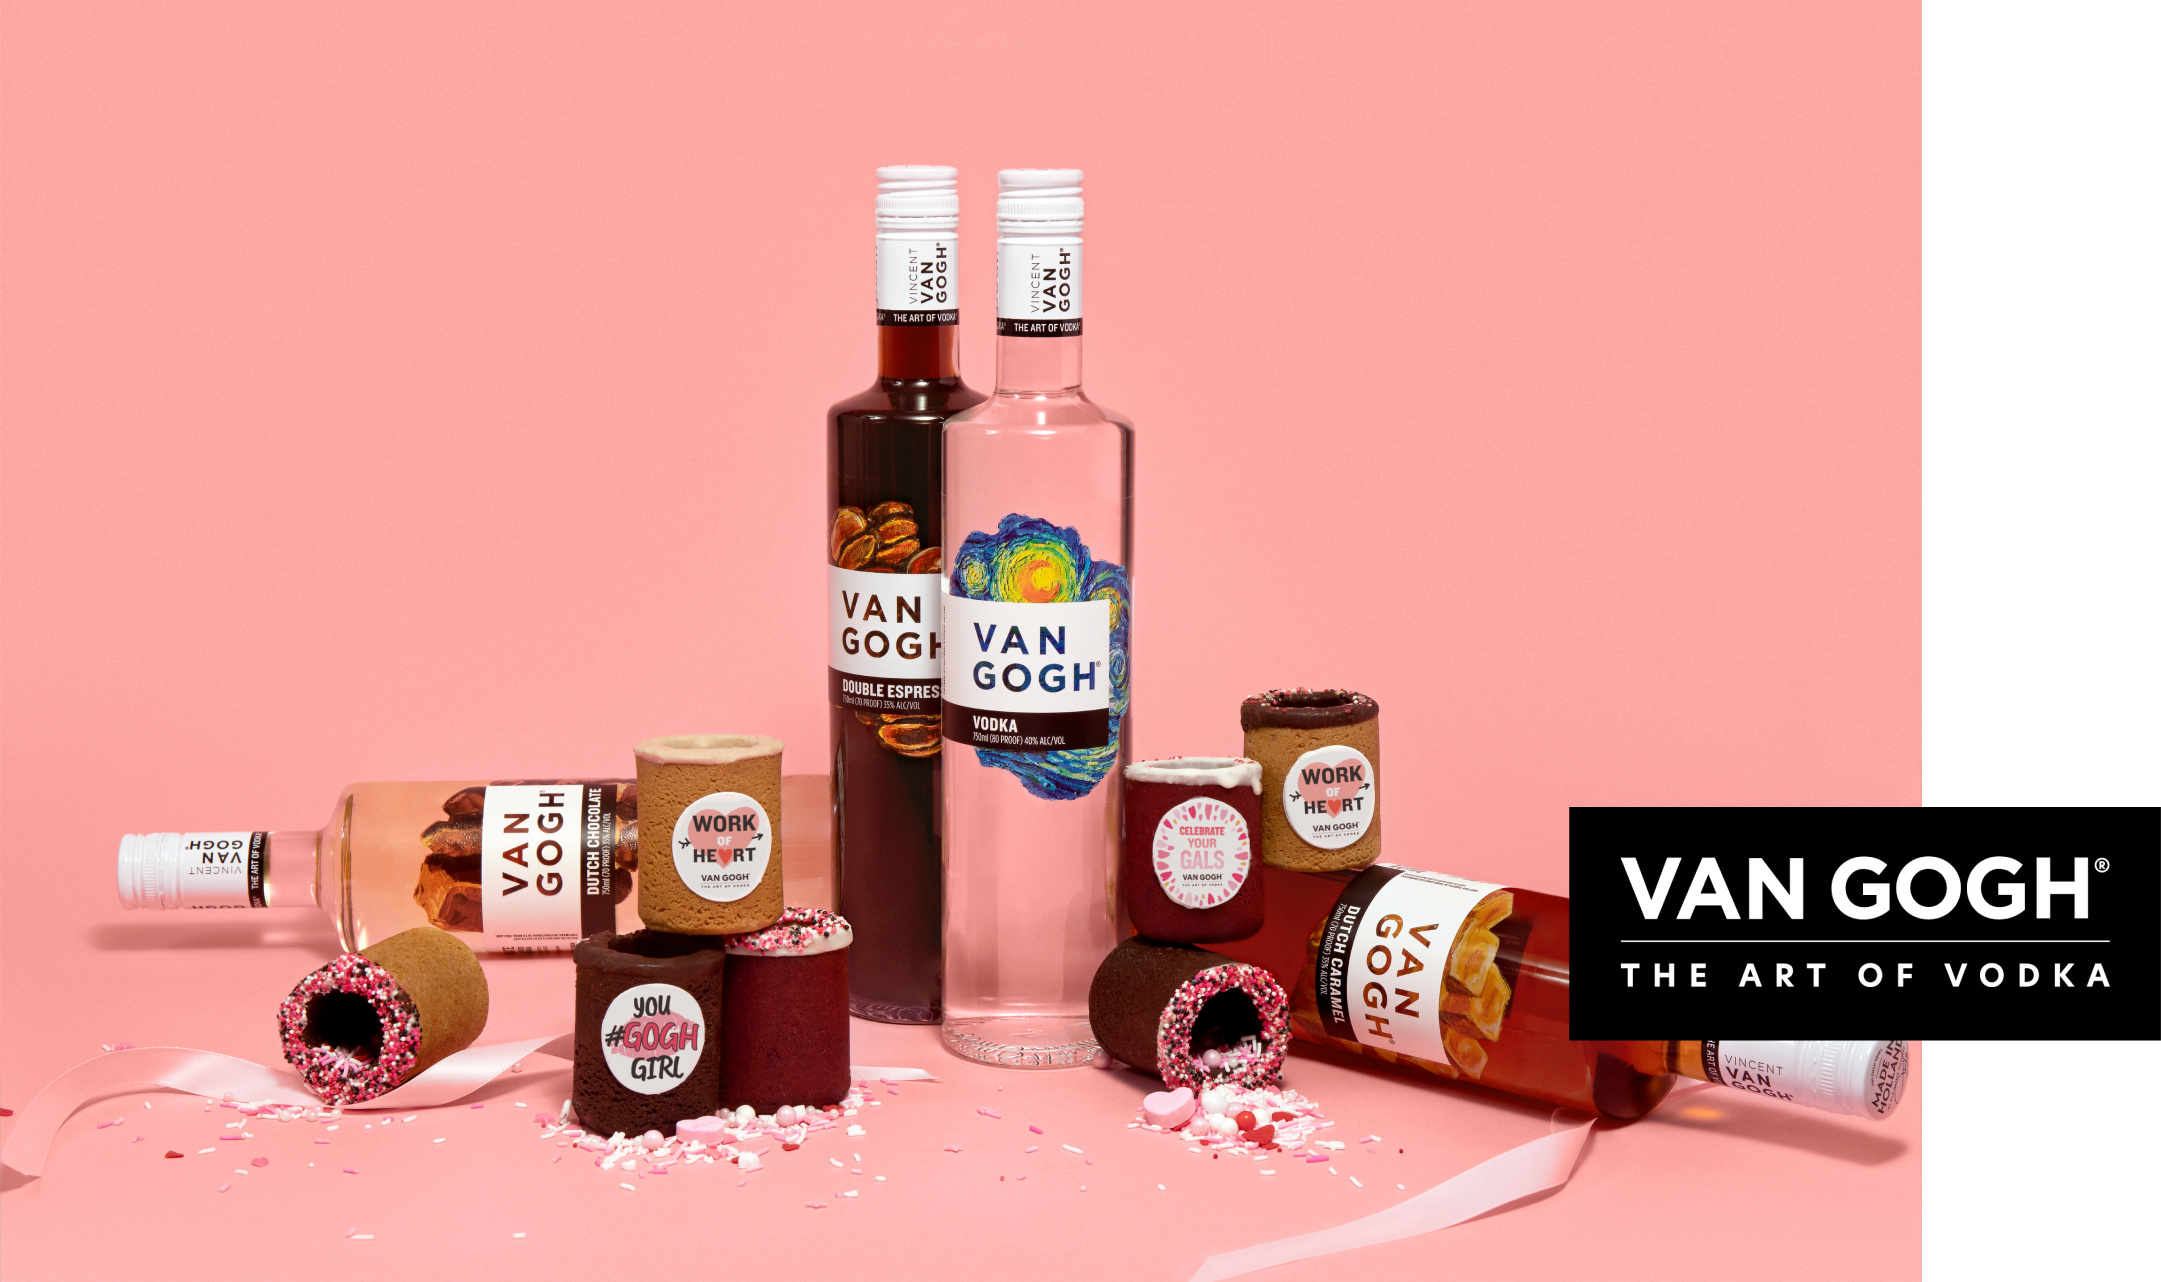 Van-Gogh-Vodka-Hero